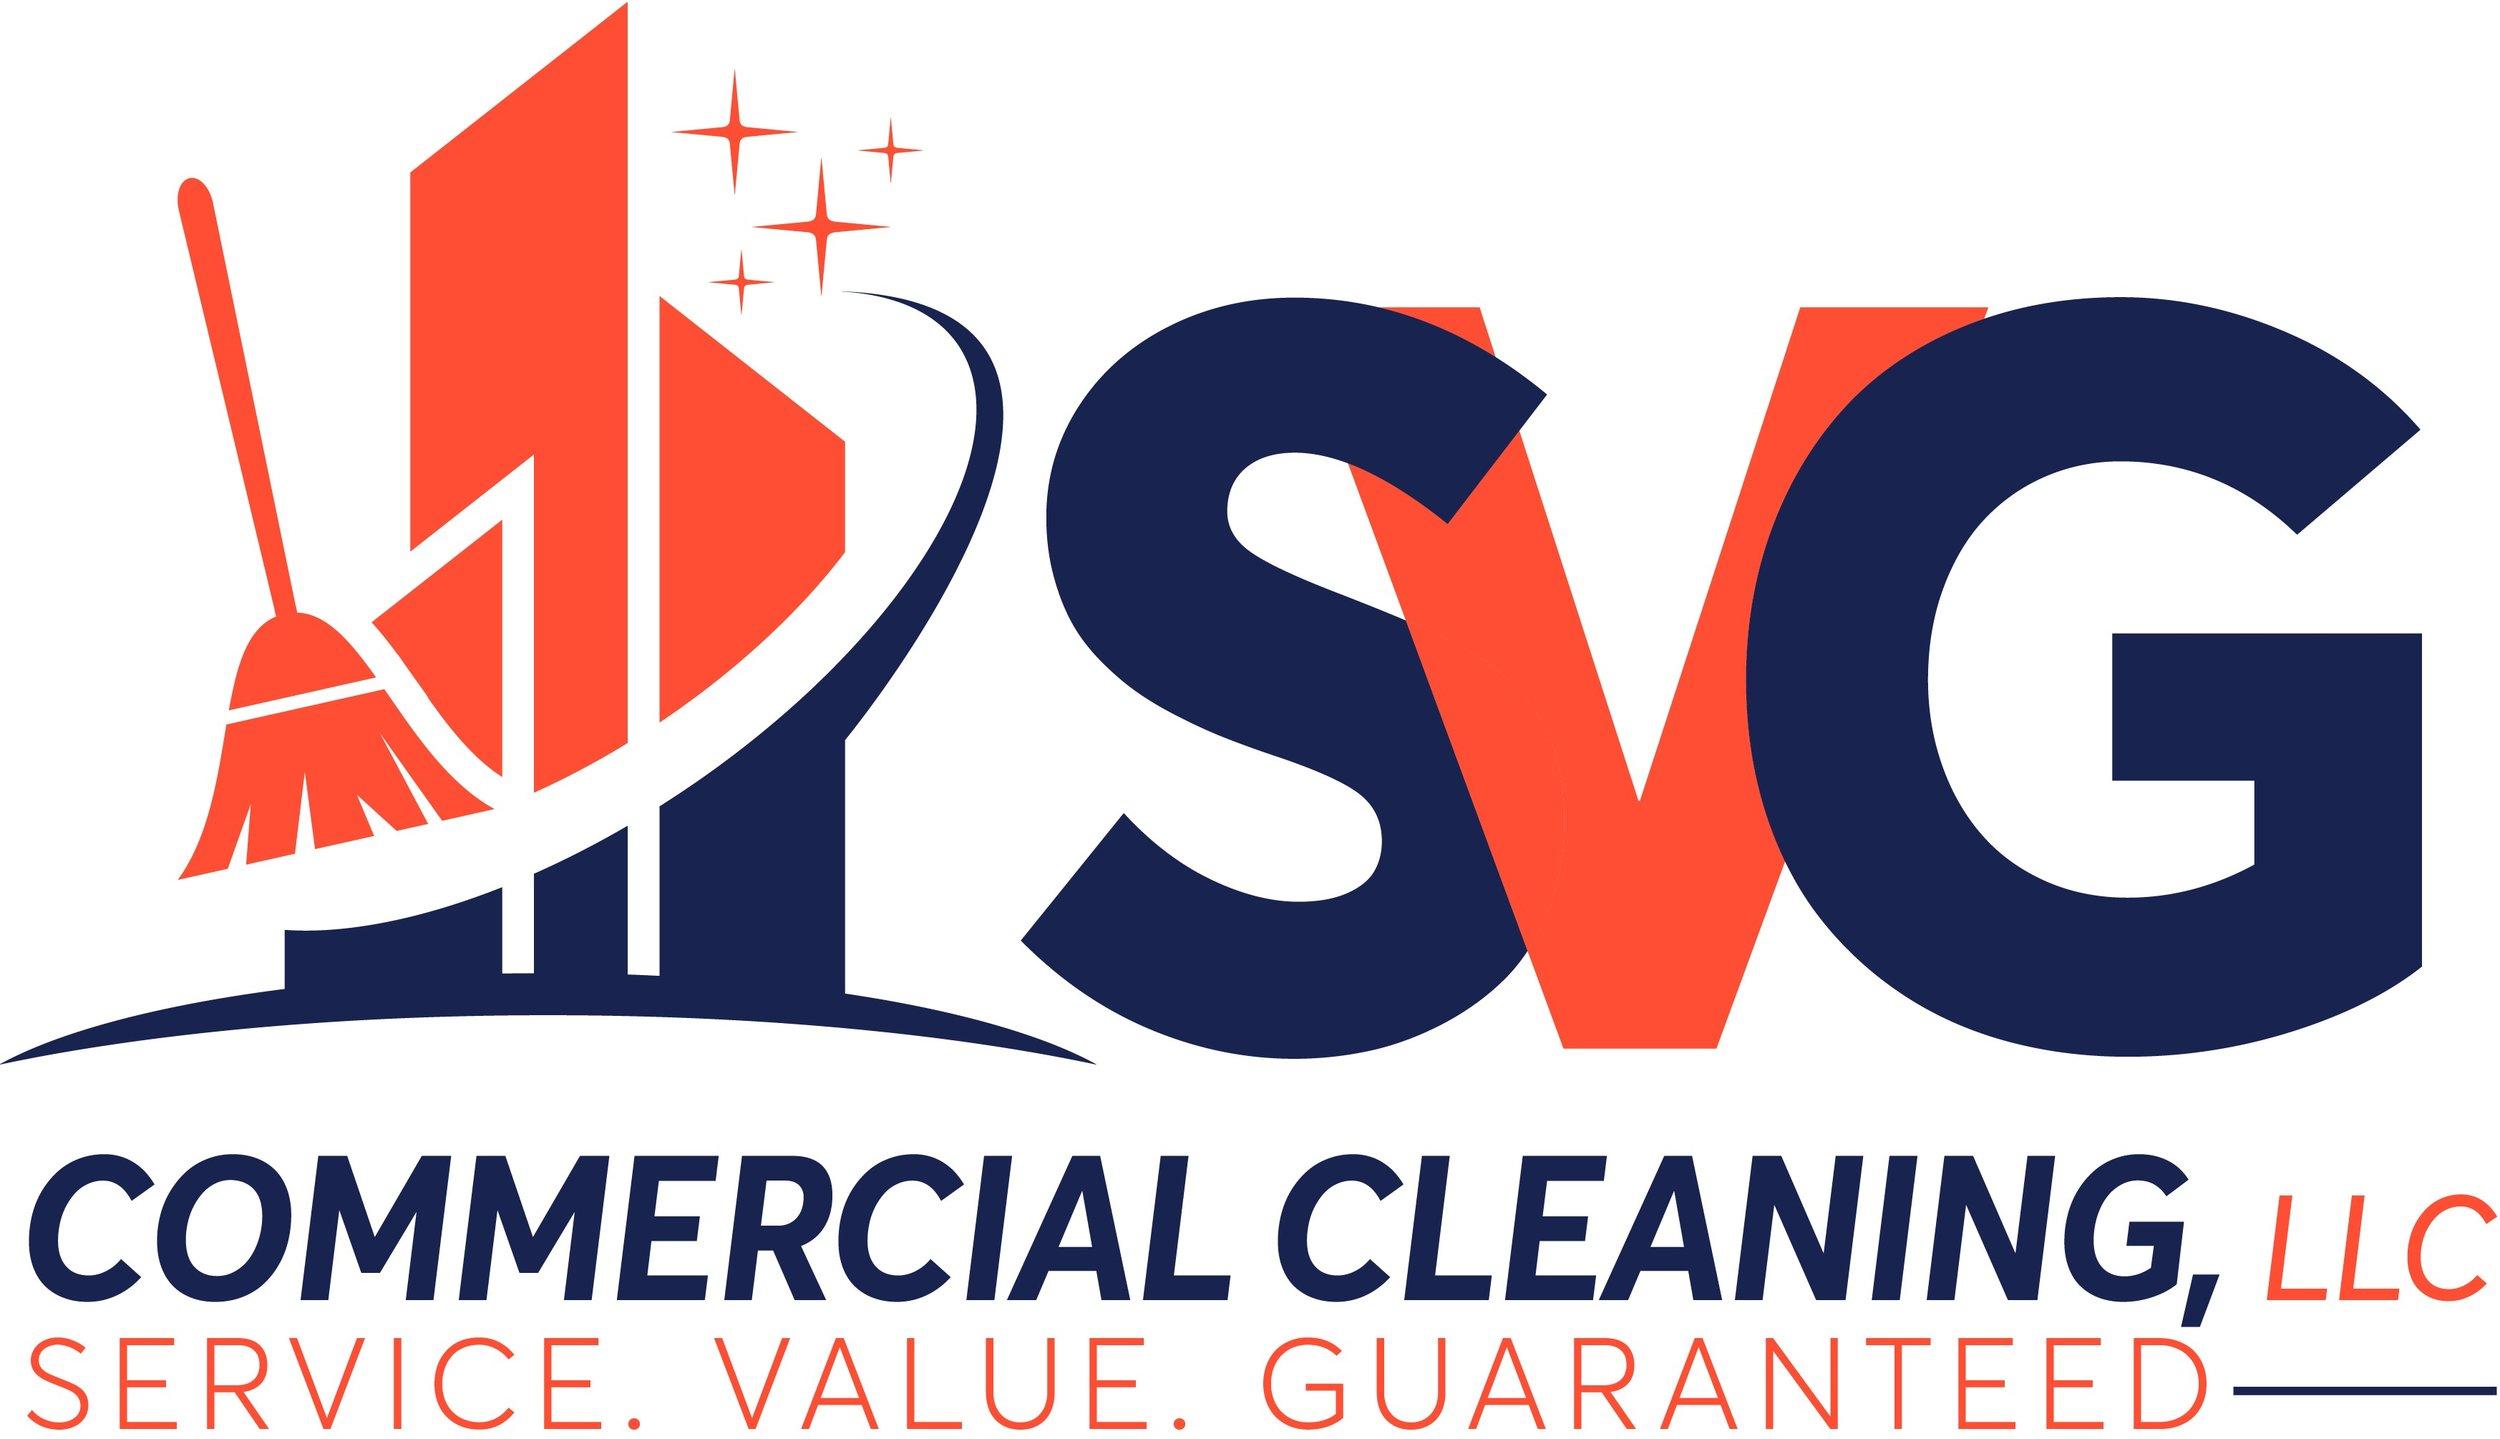 SVG Full Logo-cropped to size.jpg